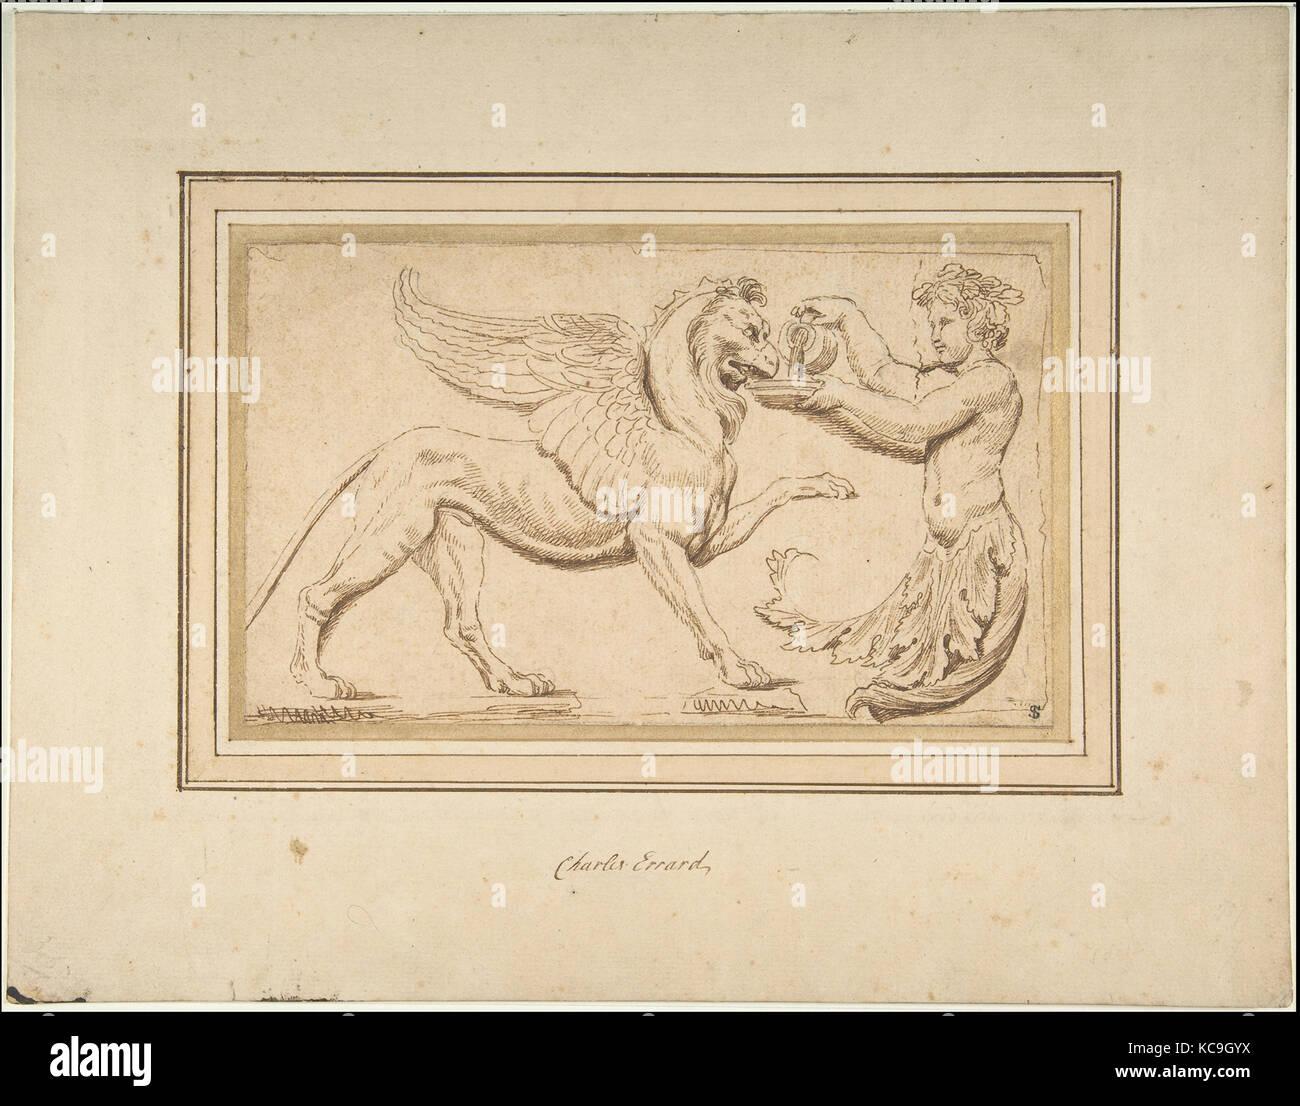 Amor Foliate verter una bebida a Griffin, Charles Errard Le fils, siglo xvii Imagen De Stock